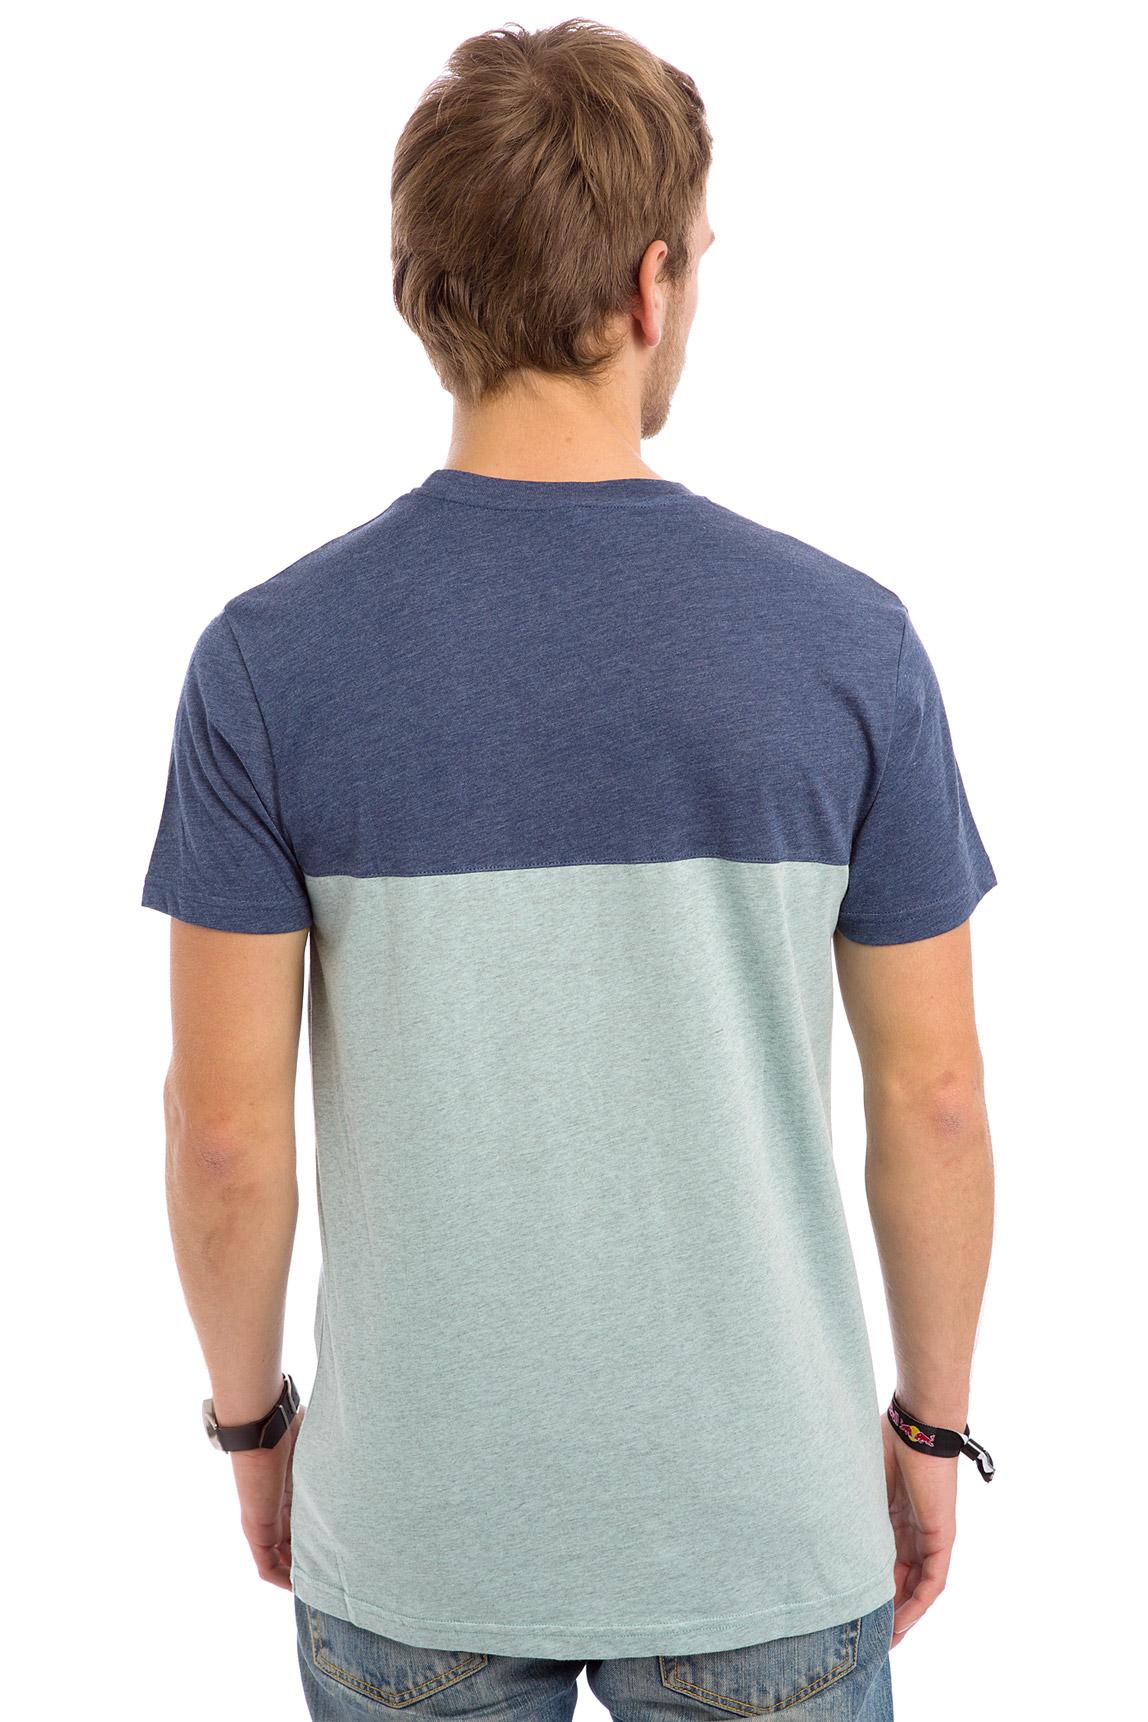 iriedaily block pocket t shirt mintgrey buy at skatedeluxe. Black Bedroom Furniture Sets. Home Design Ideas